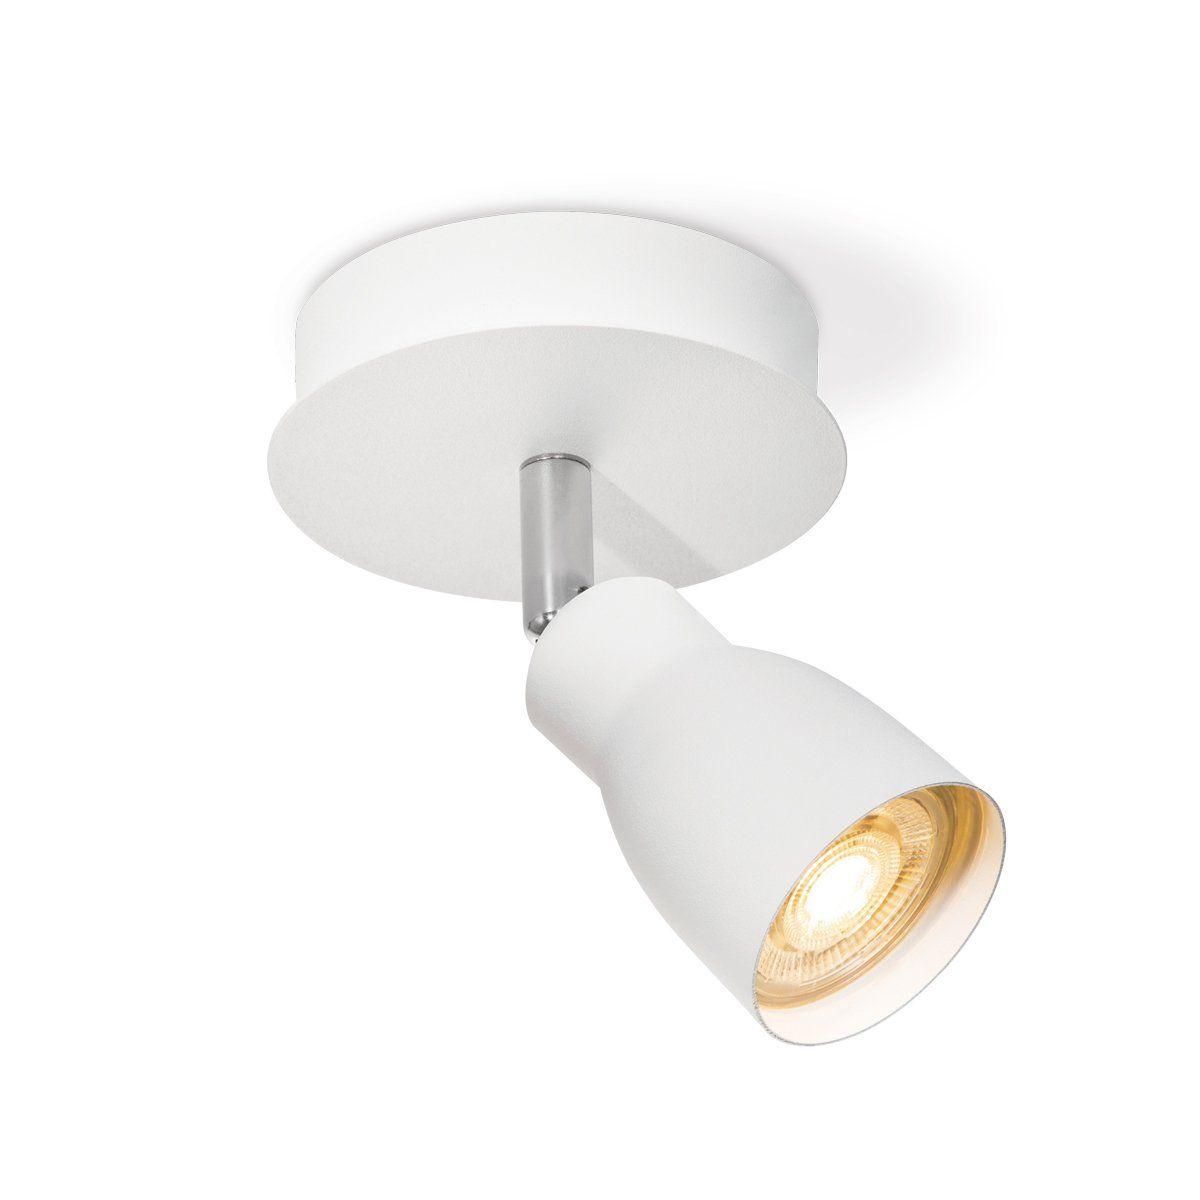 Home sweet home LED opbouwspot Alba Ø 11,5 cm - wit